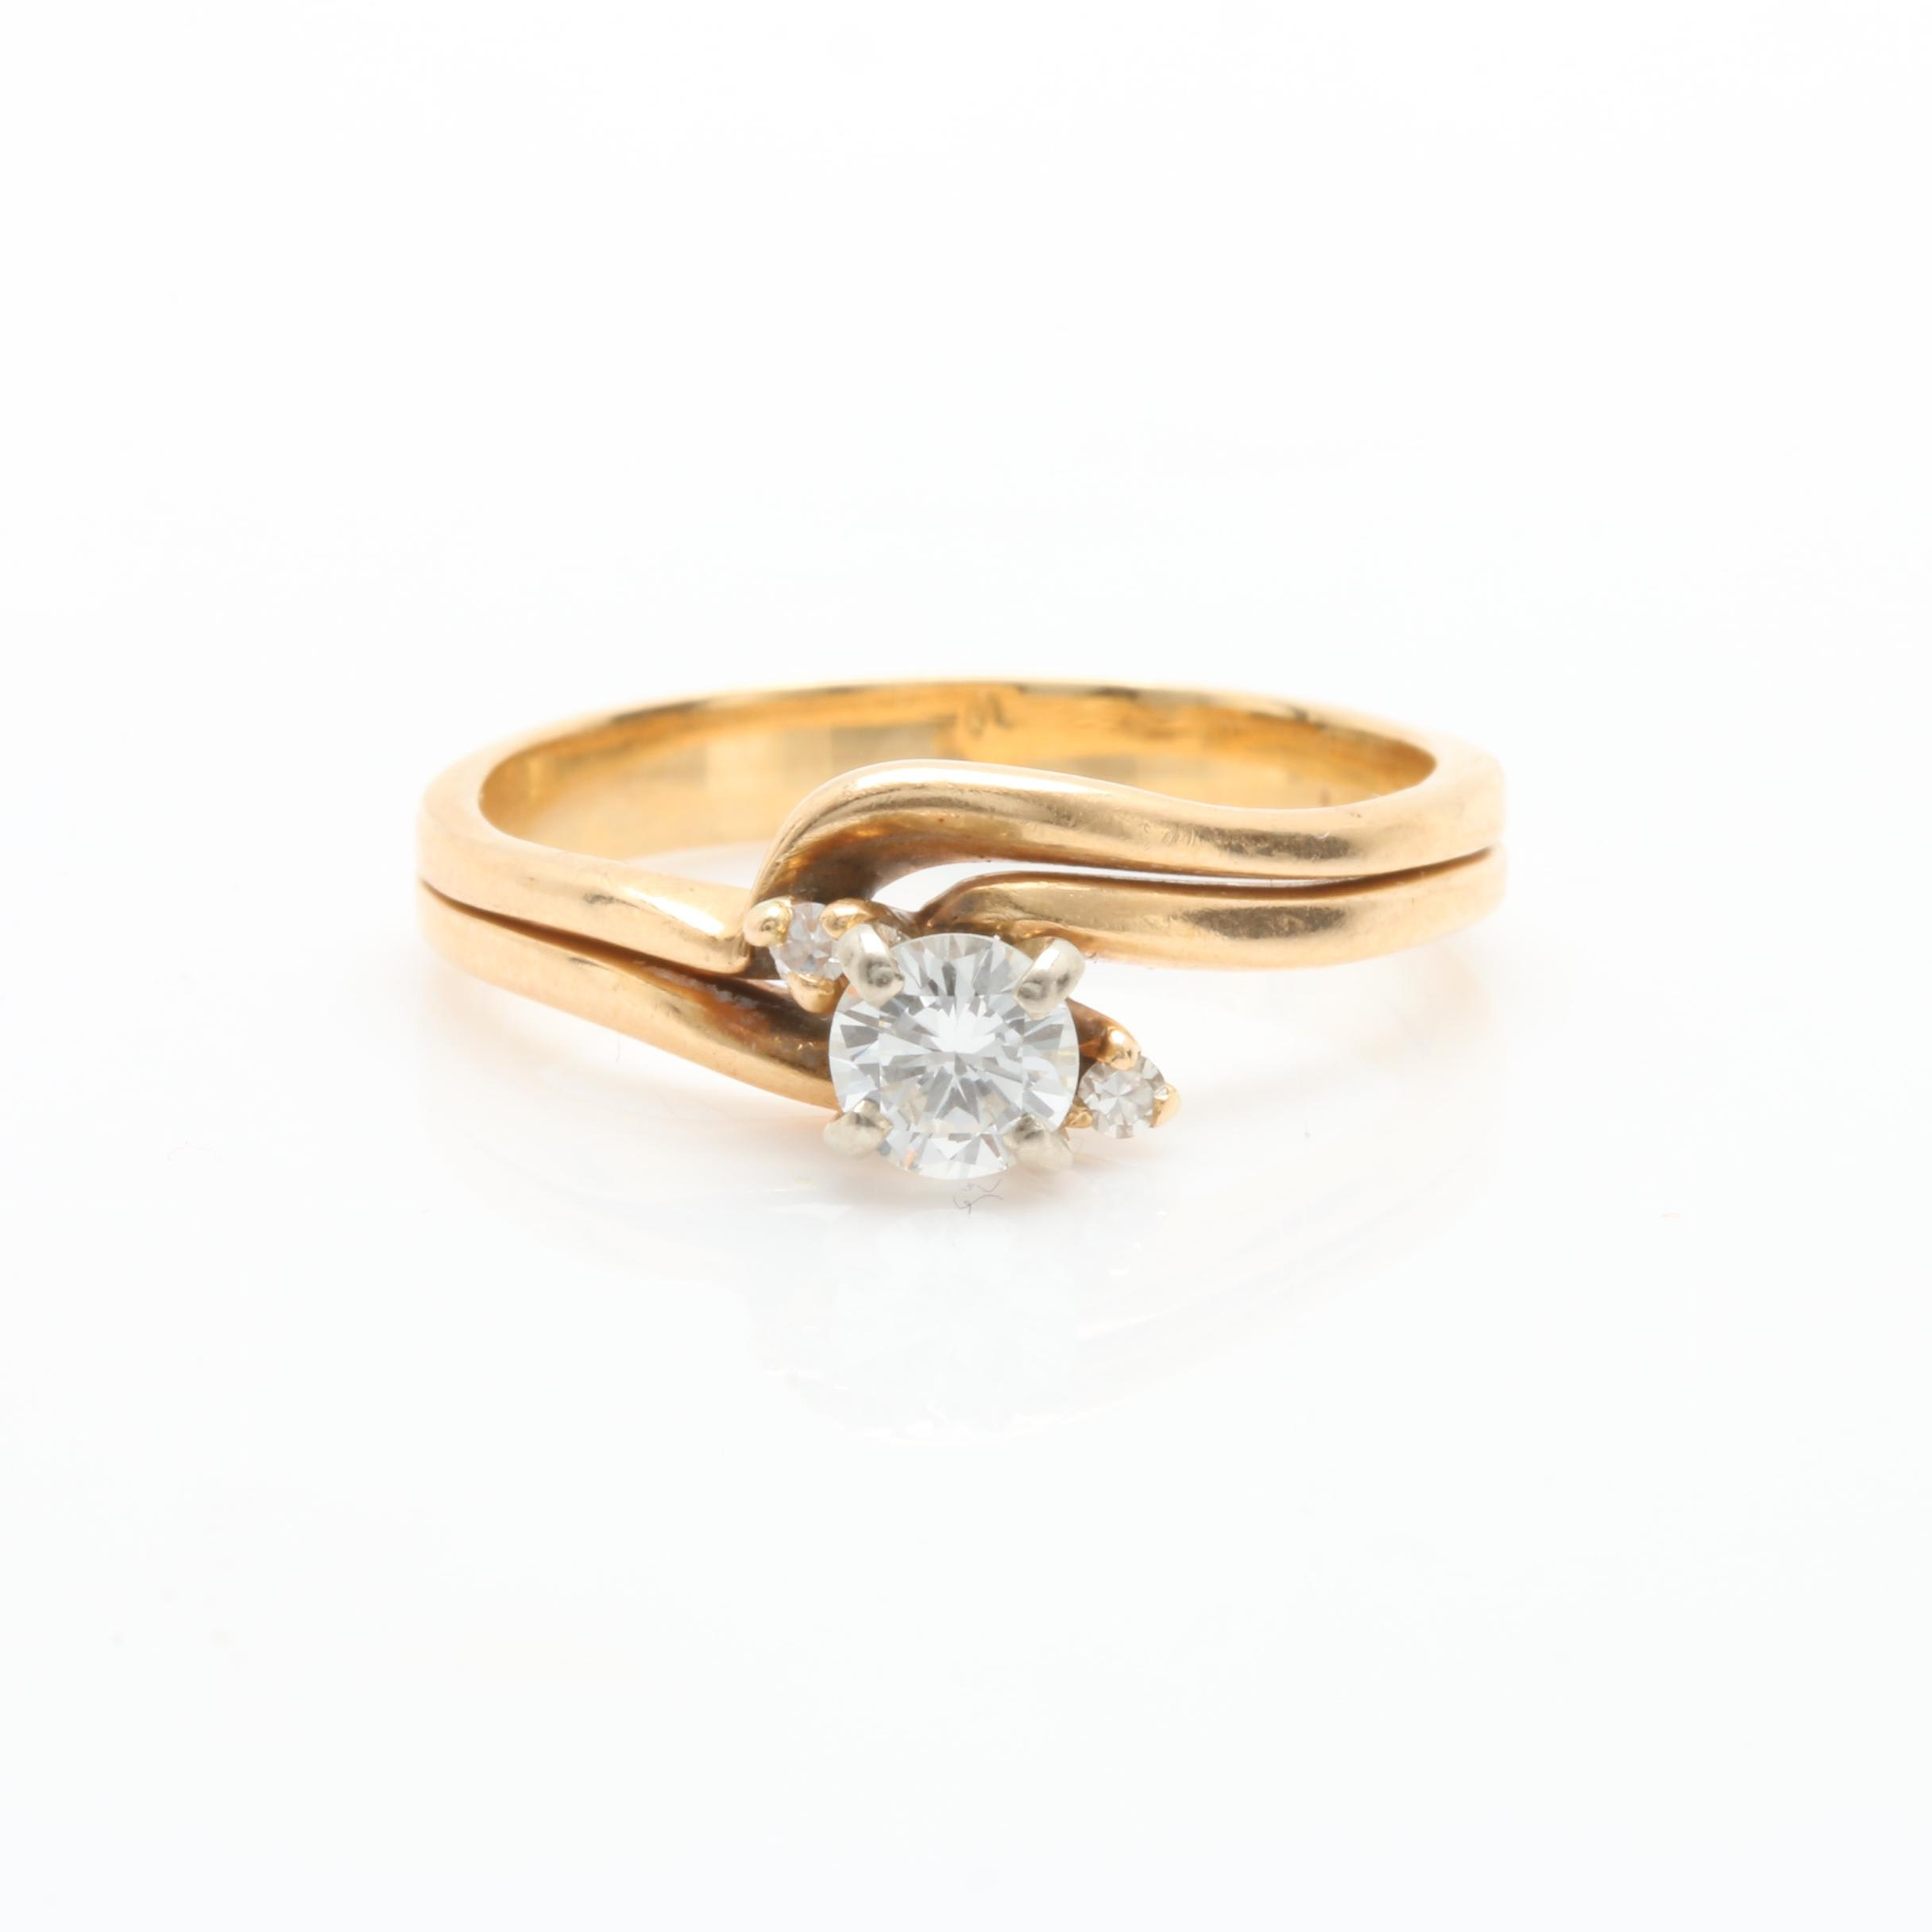 14K Yellow Gold Diamond Criss Cross Ring Set